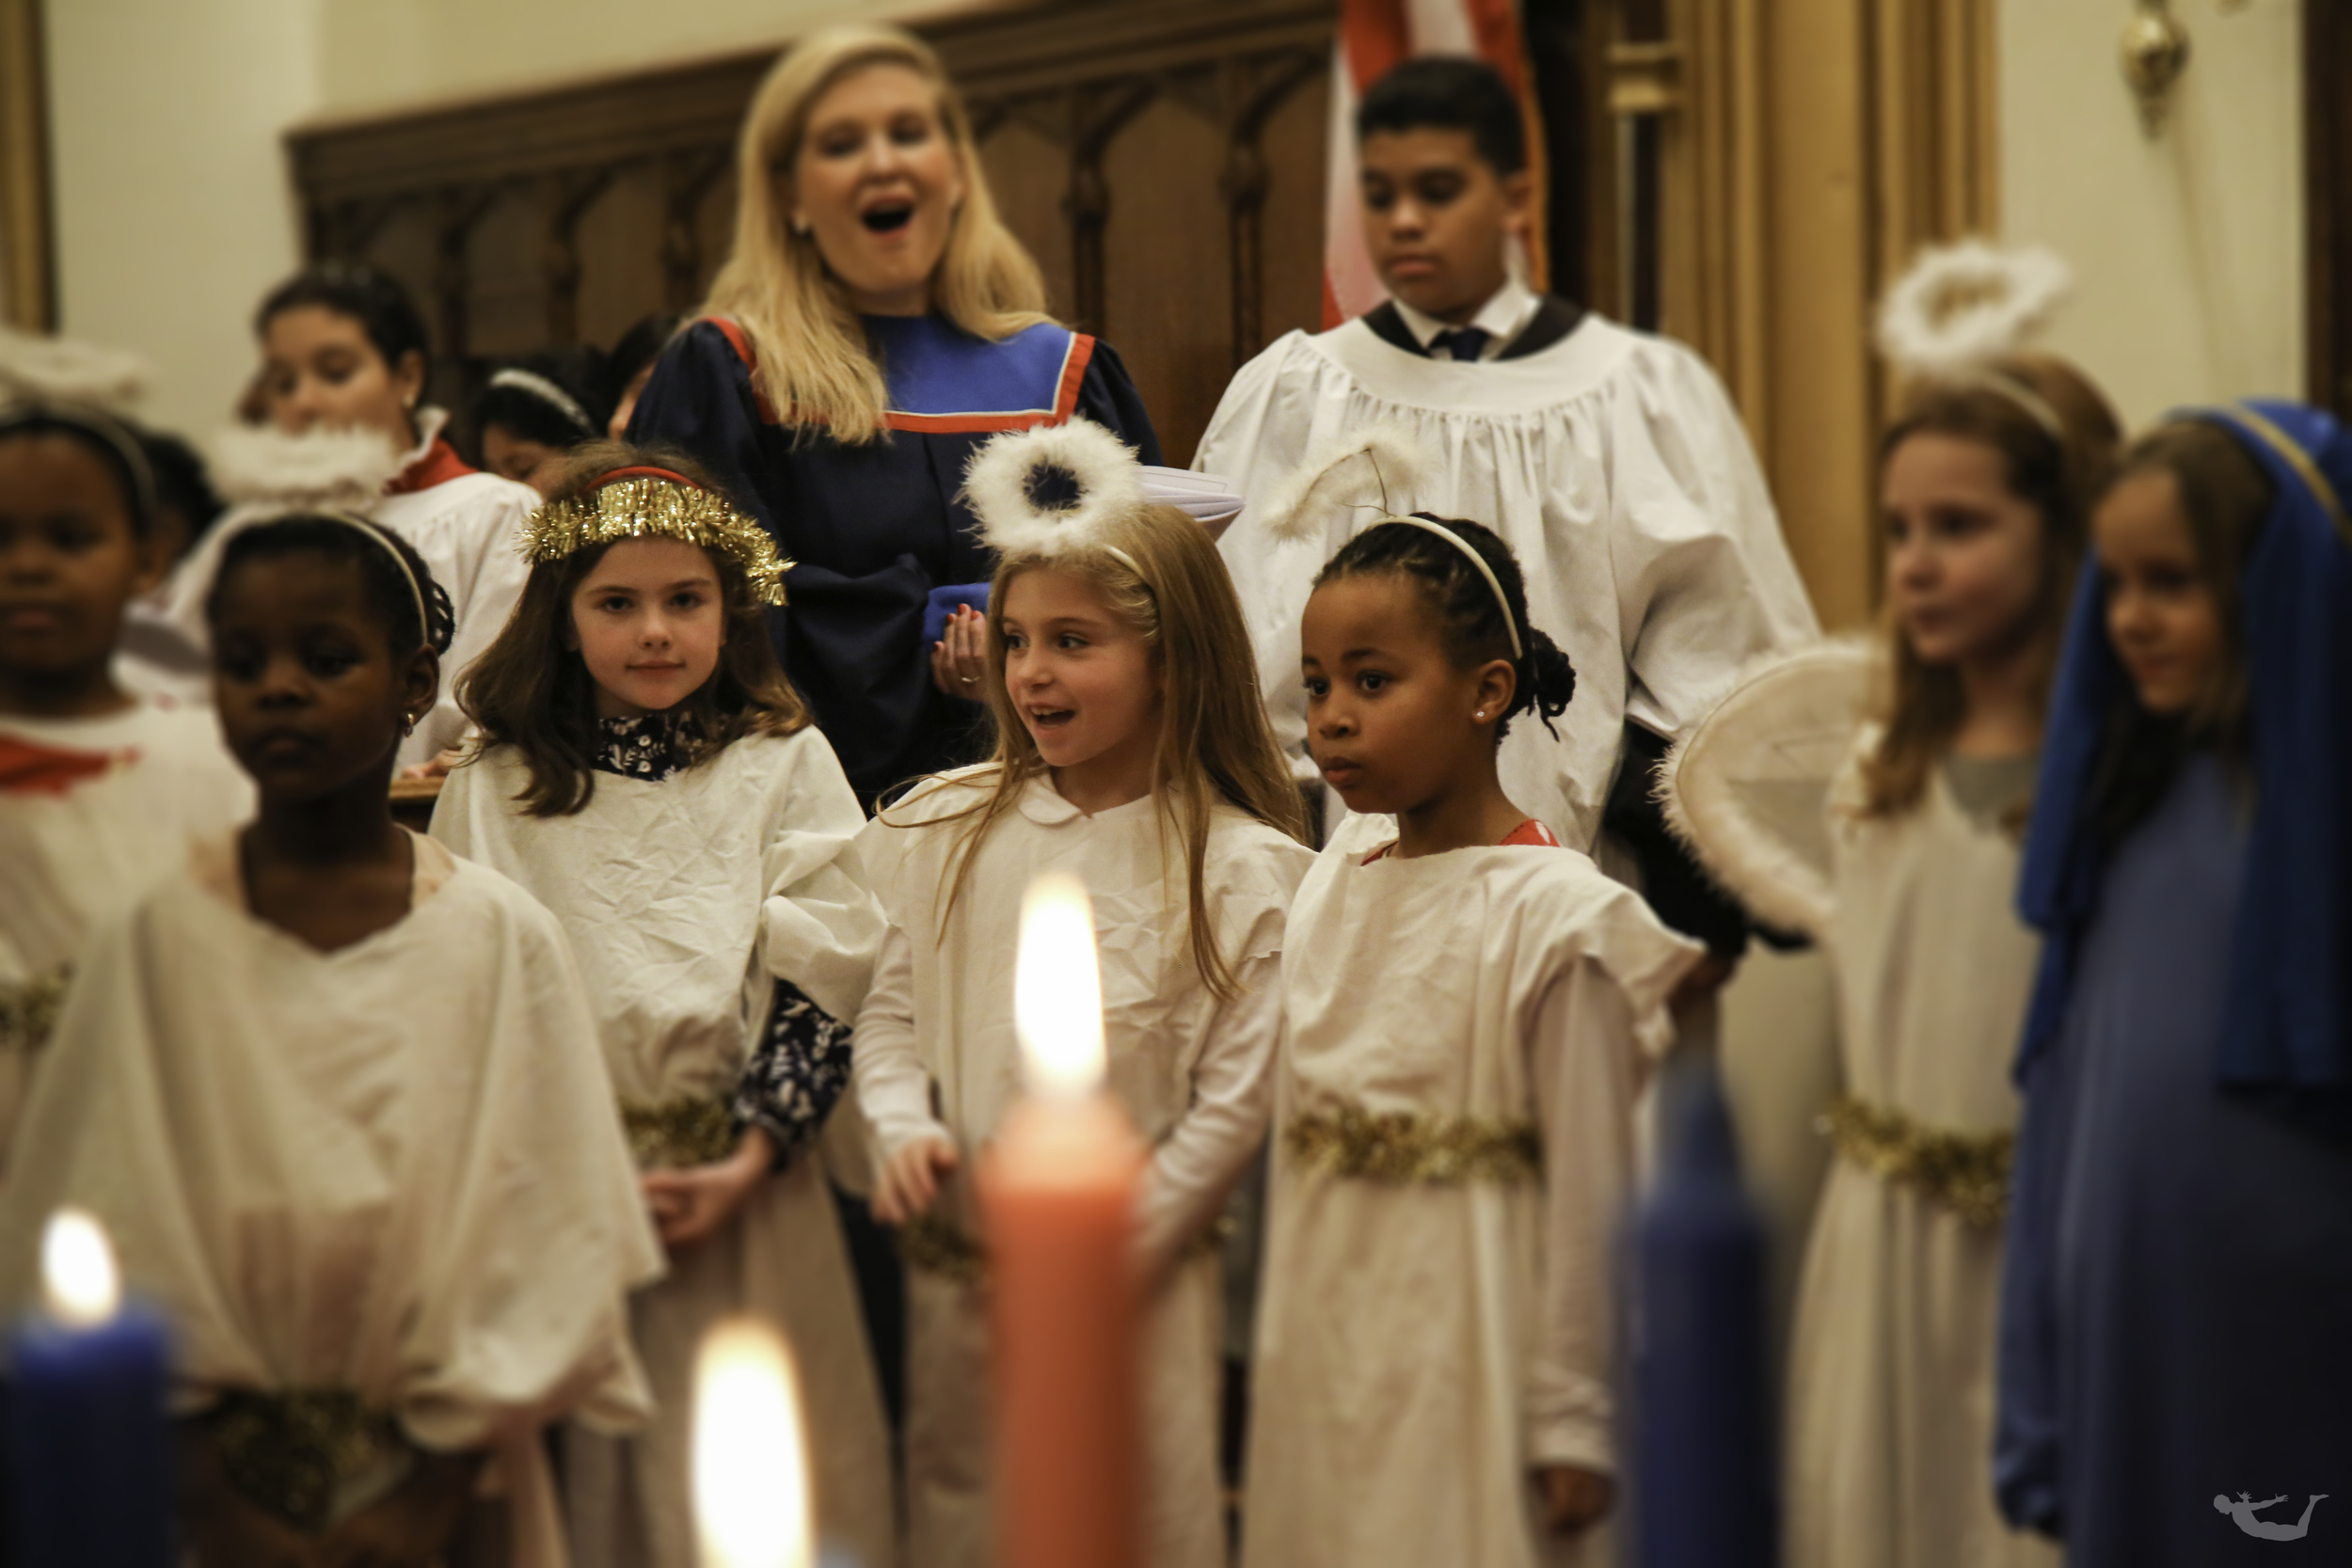 St. Albans Christmas.jpg